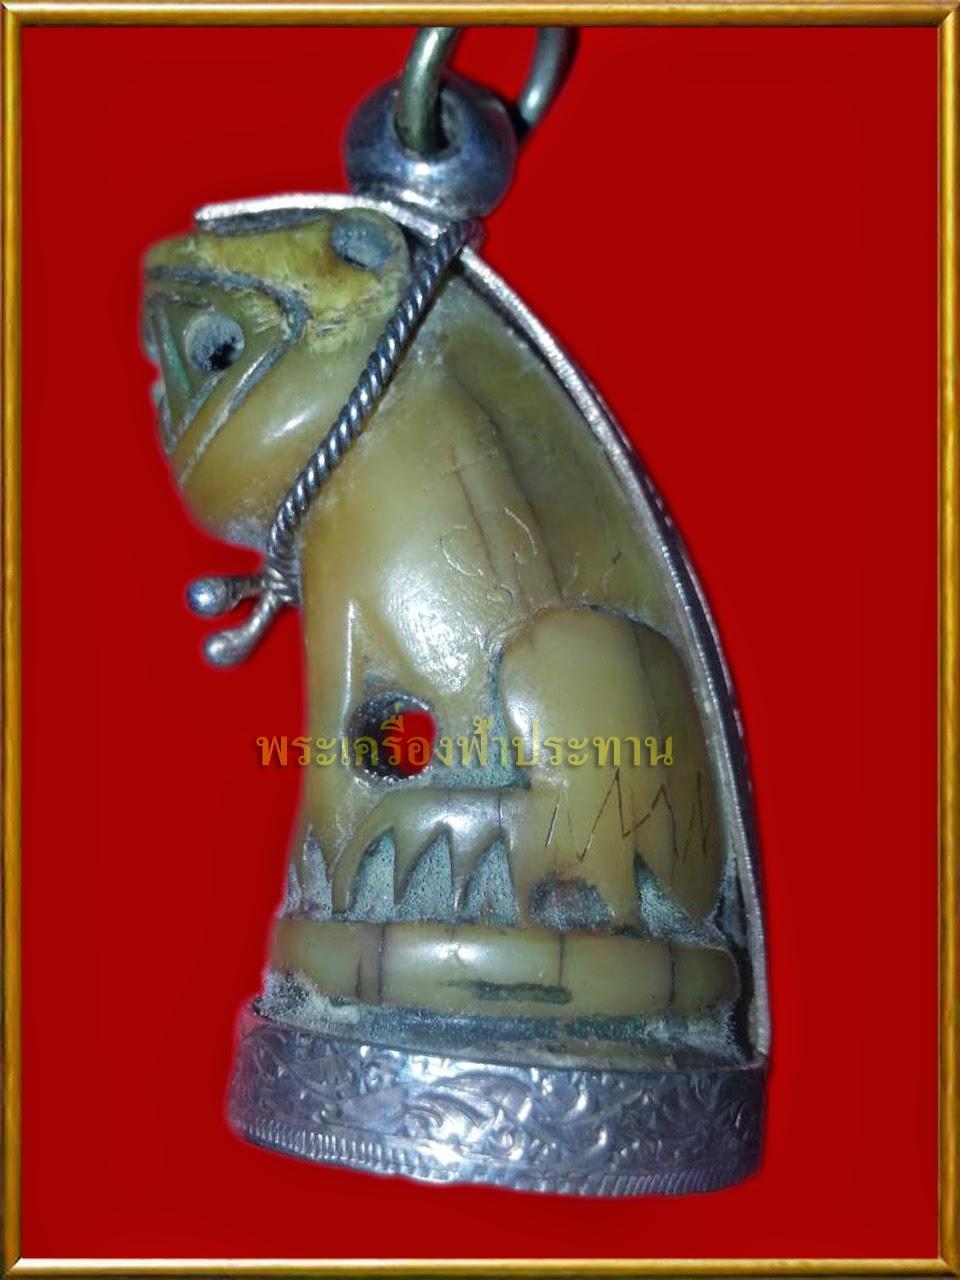 http://tubtimthong-amulet.blogspot.com/2014/11/blog-post_78.html